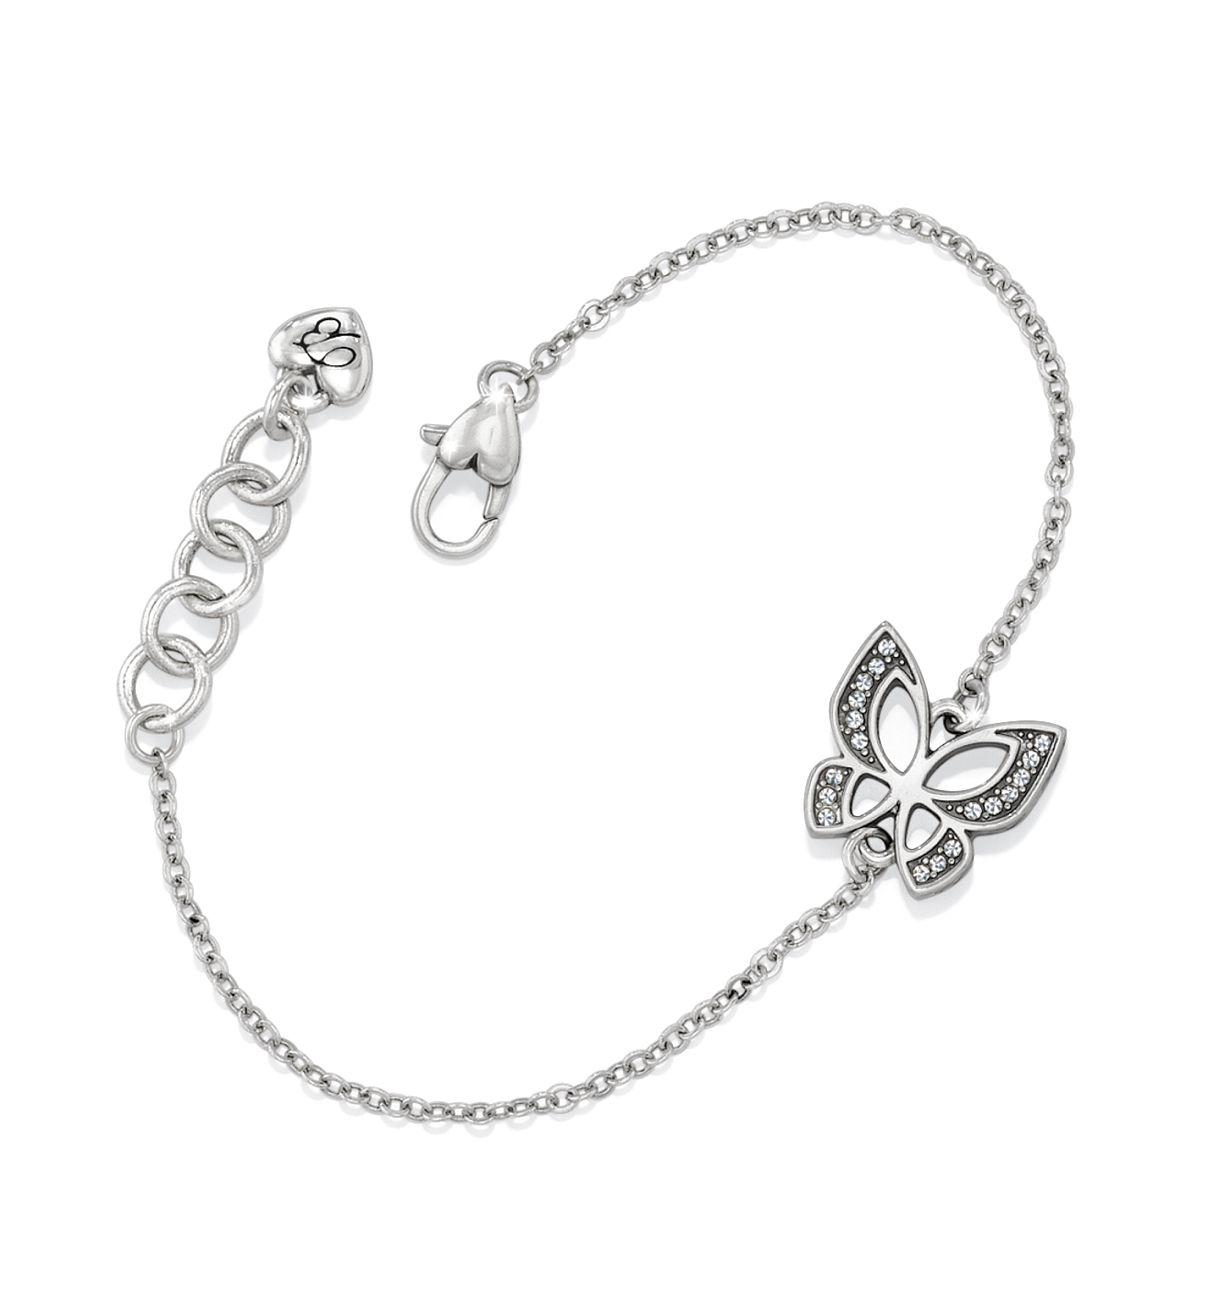 Brighton Starry Night Butterfly Bracelet